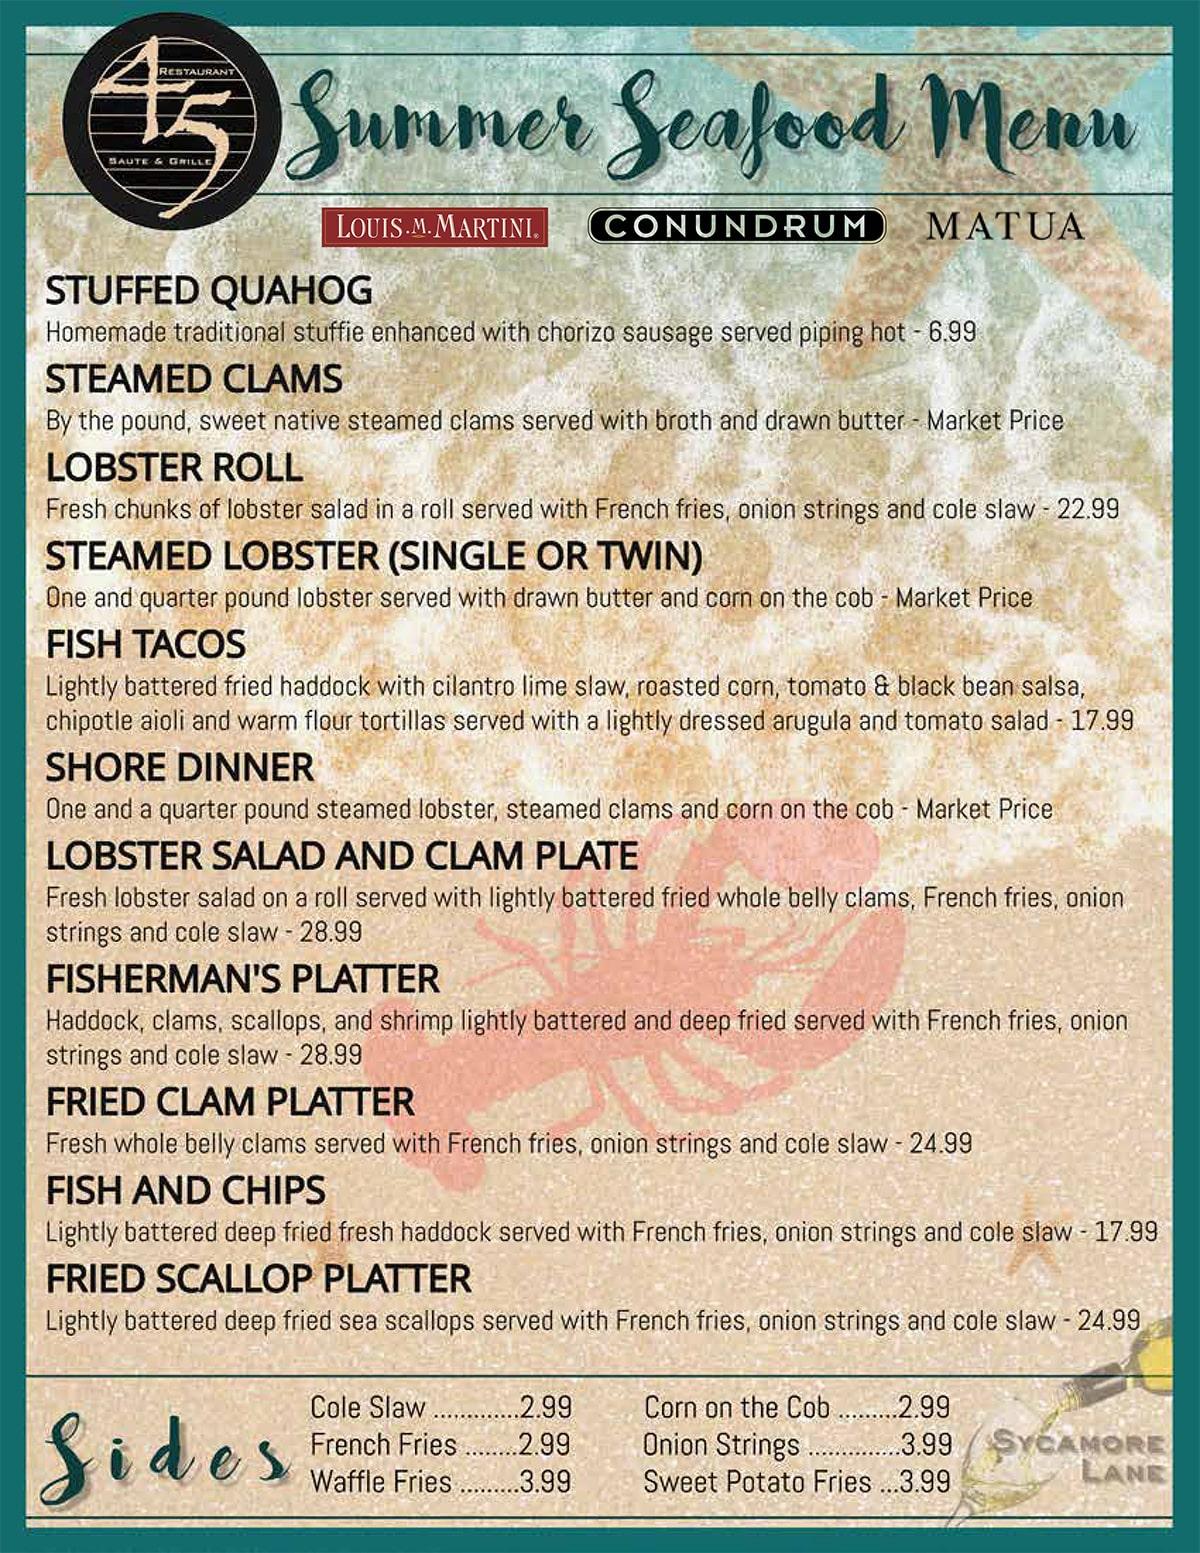 summer seafood menu restaurant